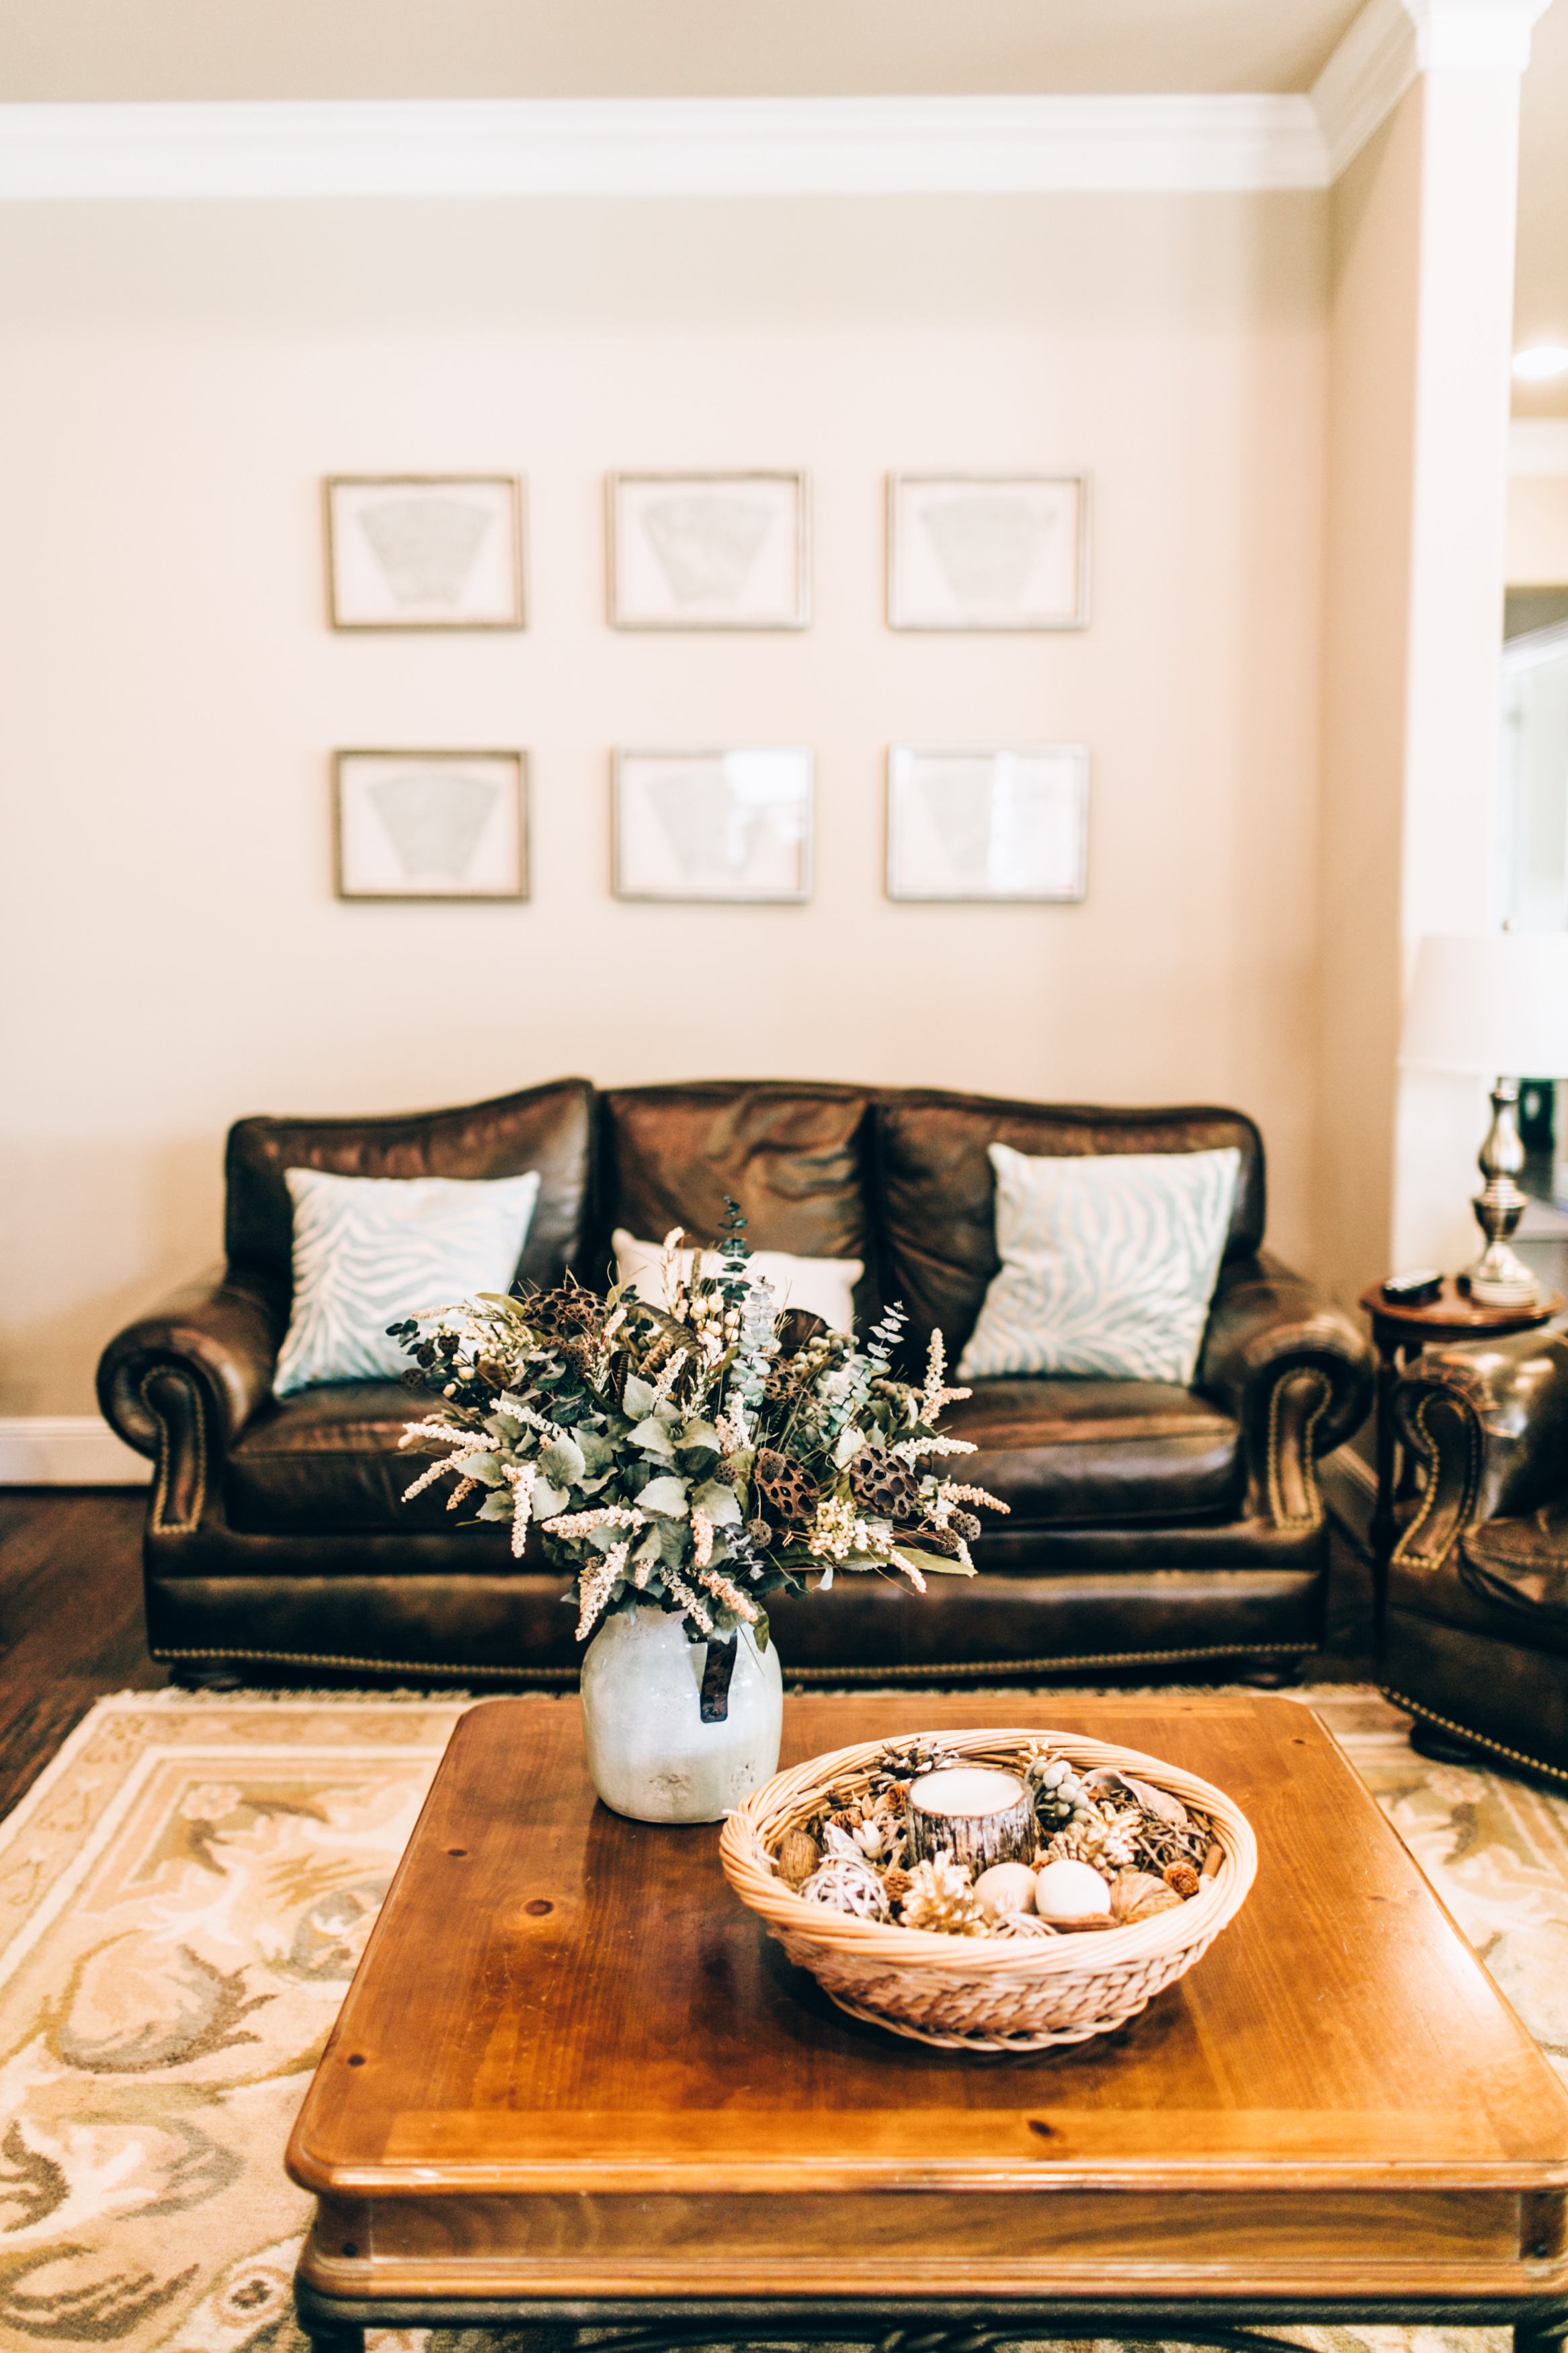 interior-design-home-decorating-339.jpg